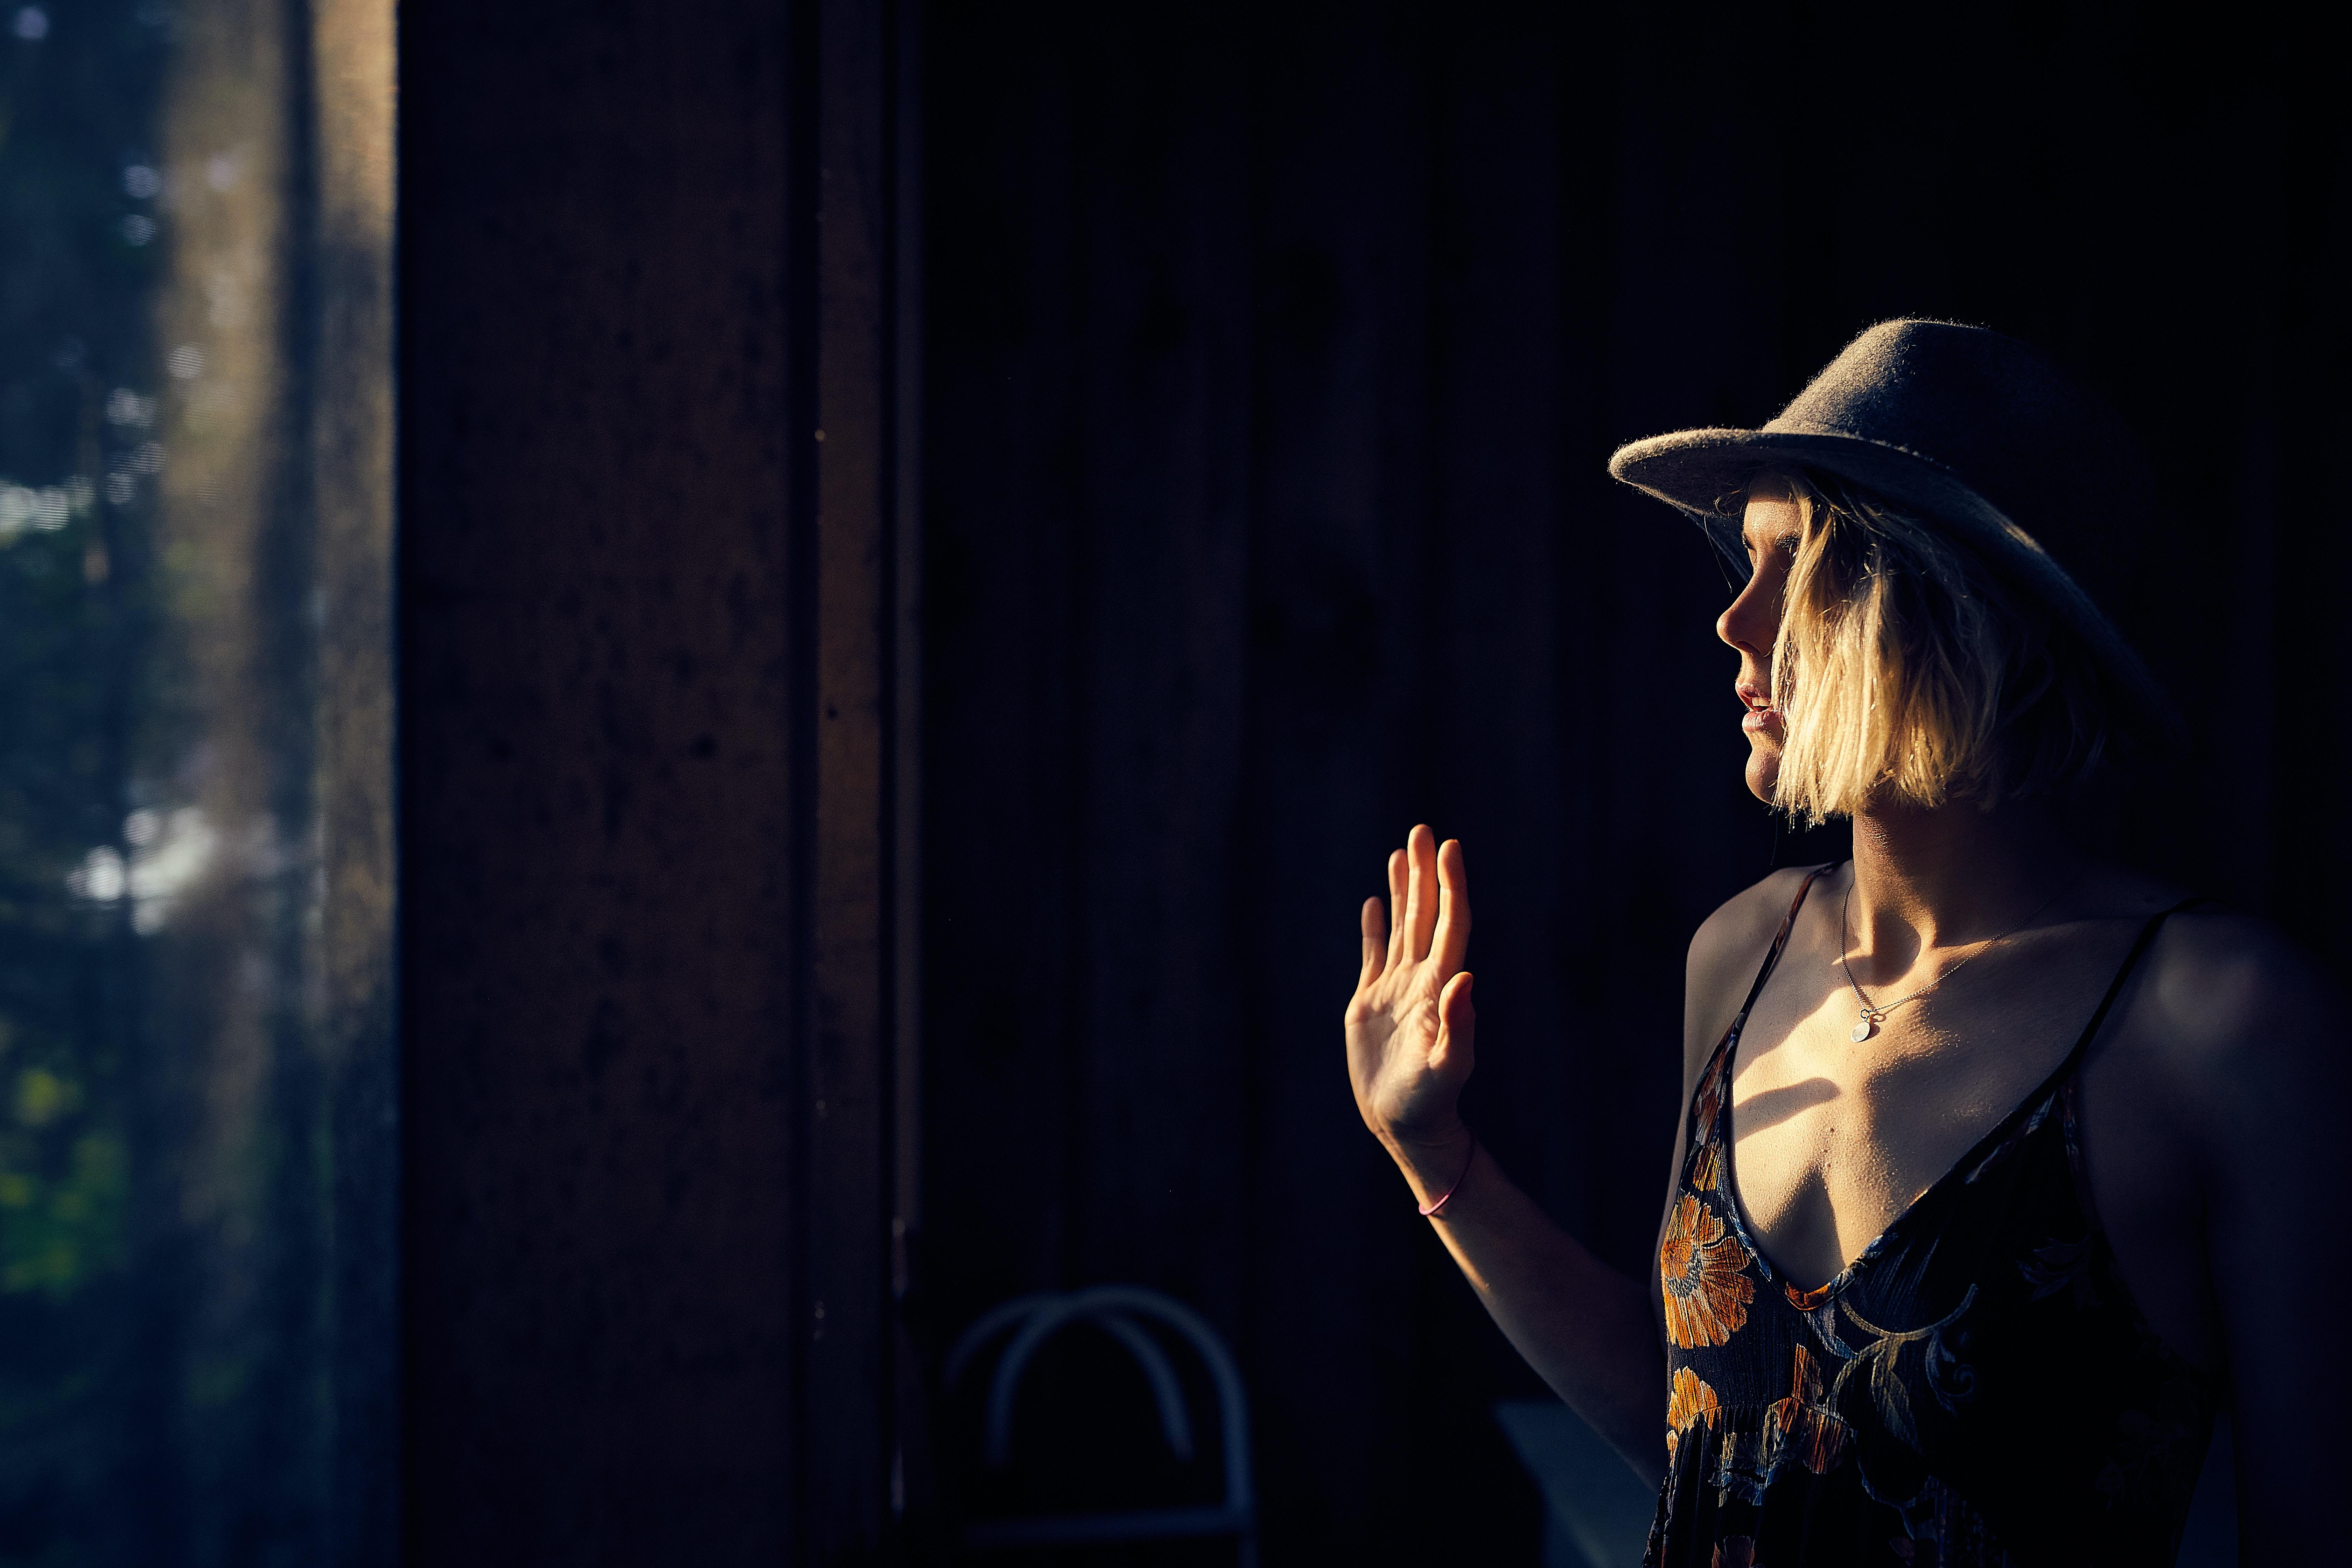 woman wearing brown floral spaghetti-strap dress standing beside window